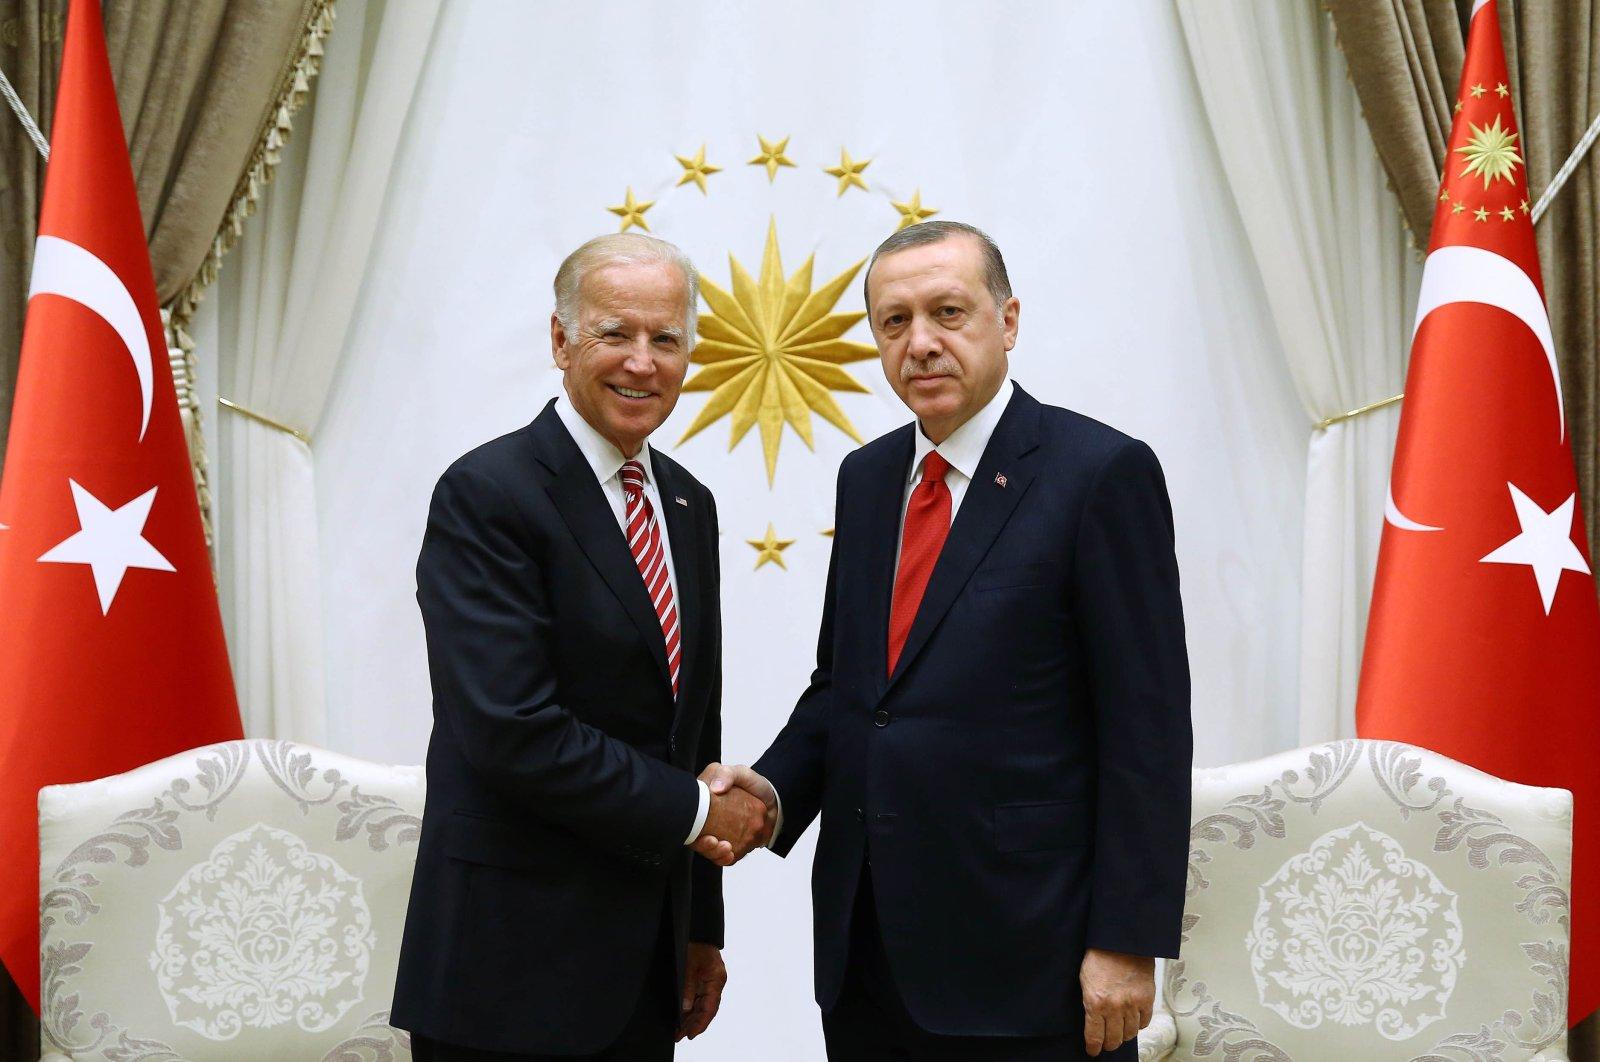 This file photo shows President Recep Tayyip Erdoğan and then-U.S. Vice President Joe Biden during a meeting in the capital Ankara, Turkey, Aug. 24, 2016. (AA Photo)